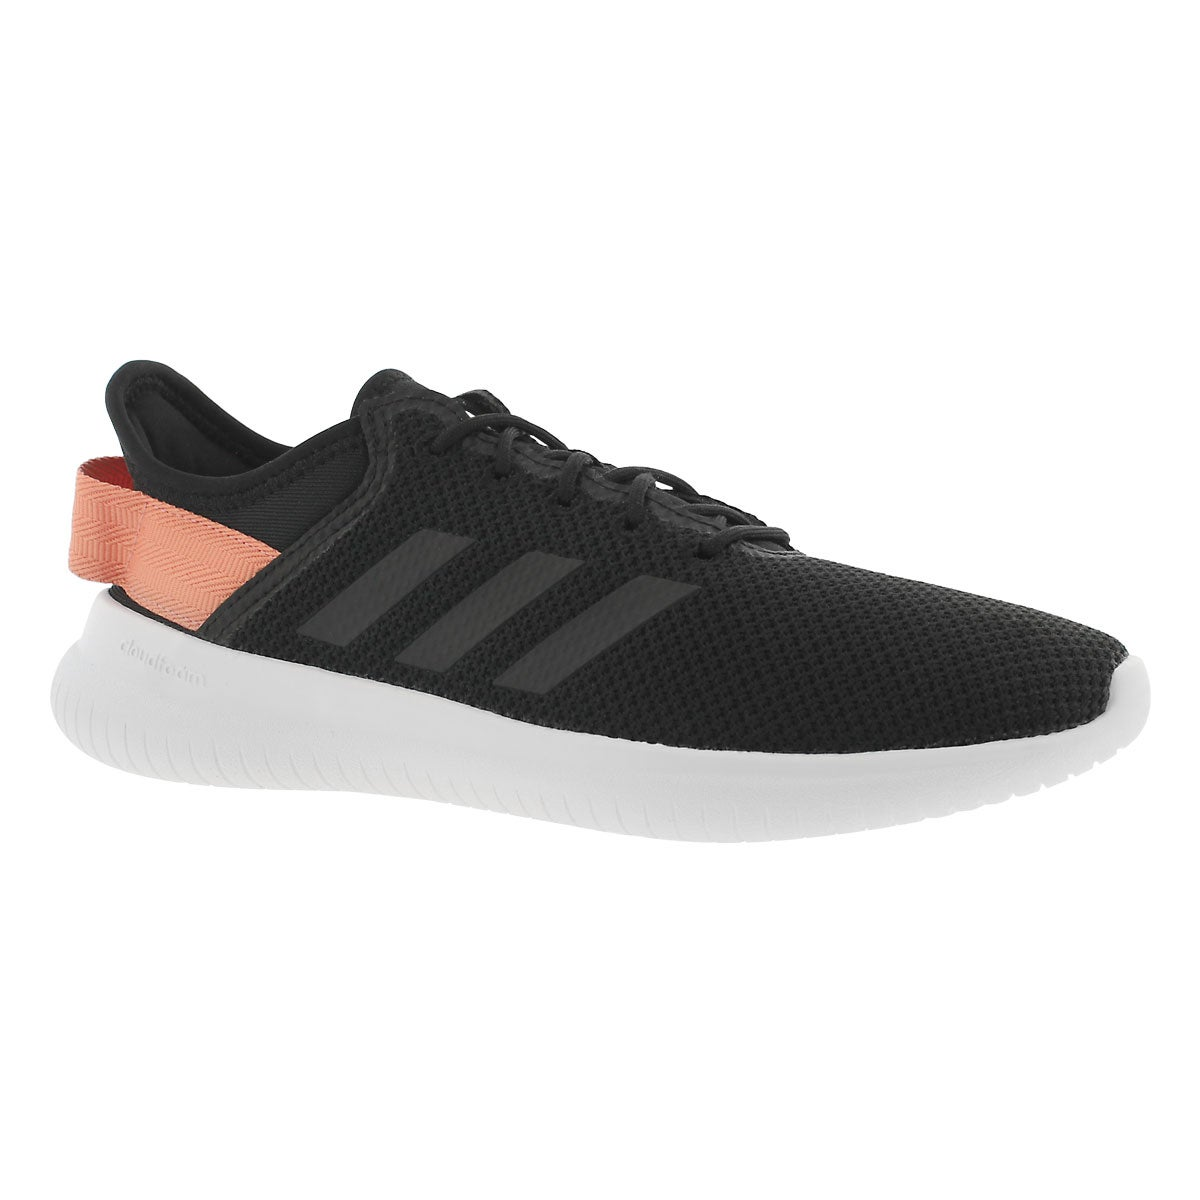 Adidas S Flex Running Shoes